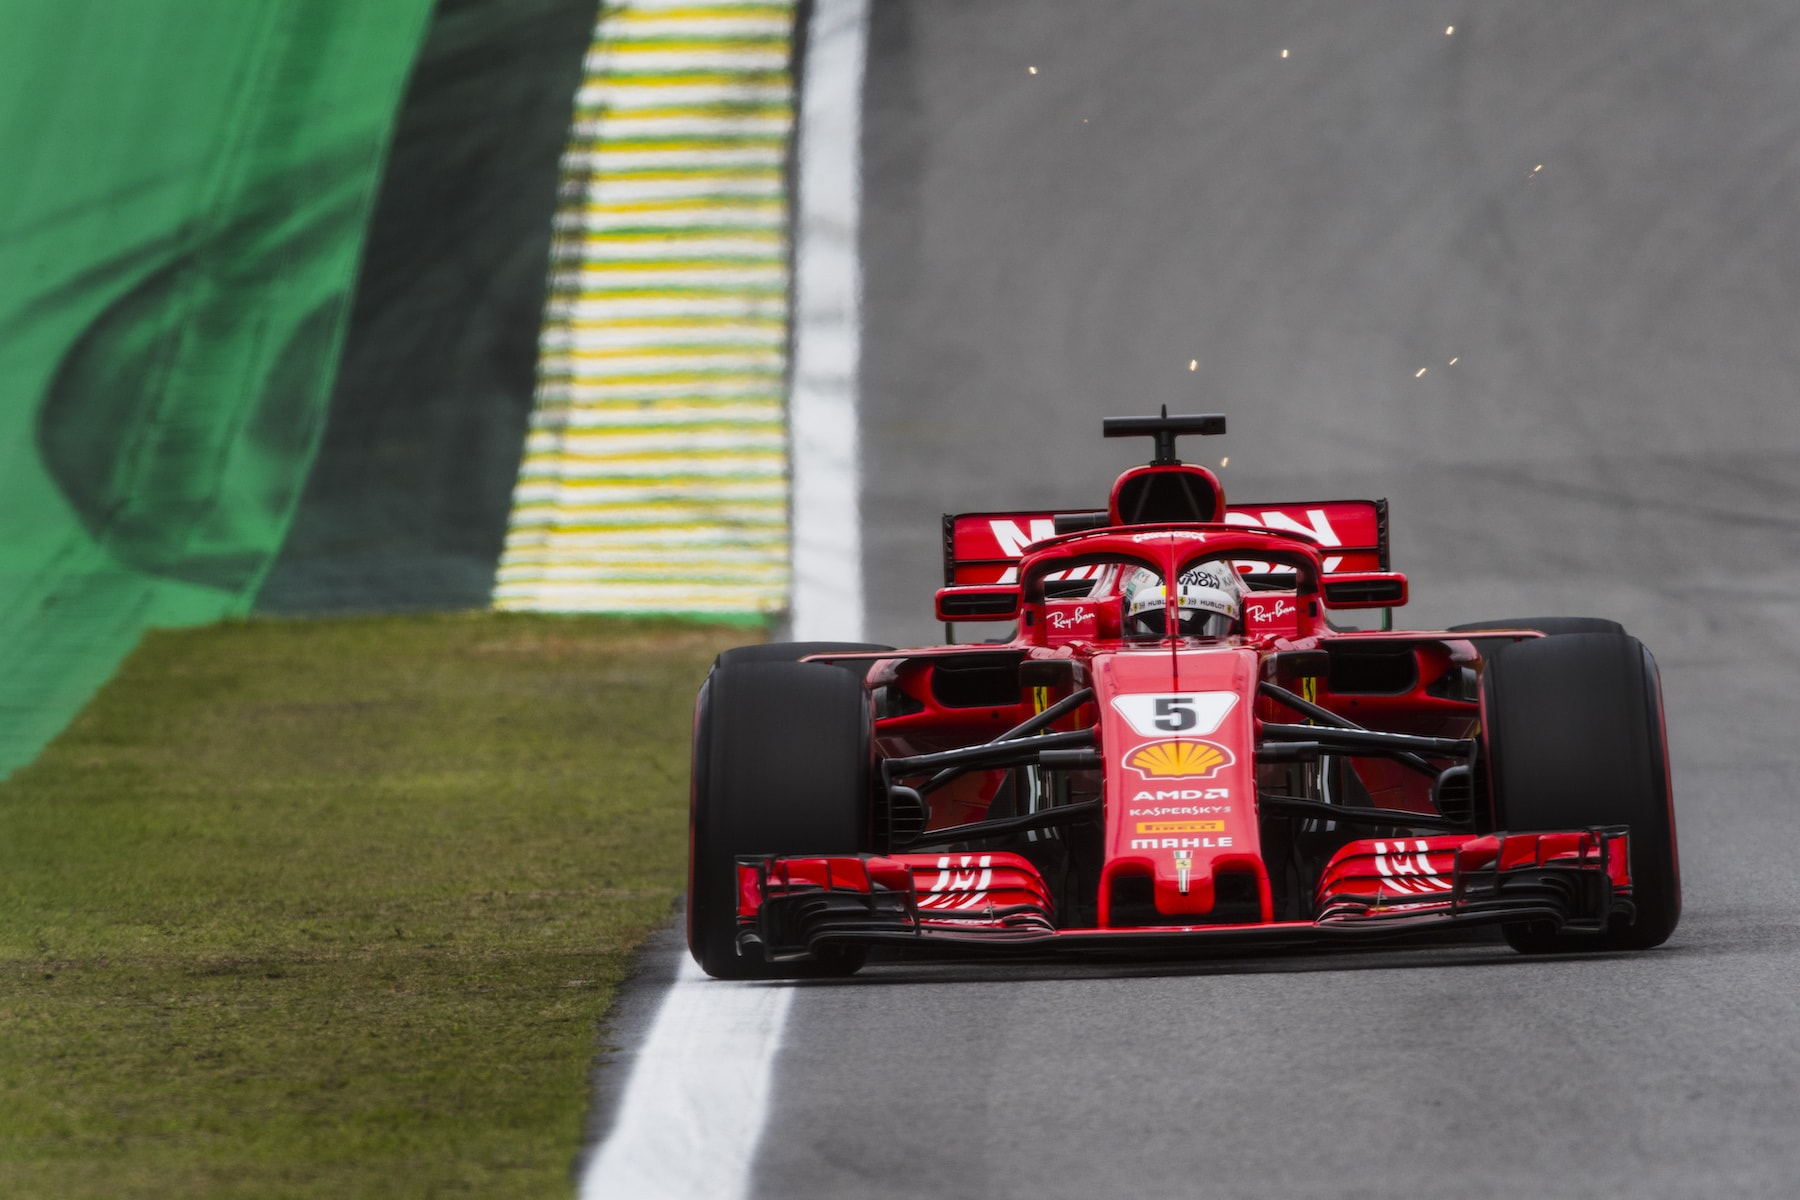 2 2018 Sebastian Vettel | Ferrari SF71H | 2018 Brazilian GP Q3 1 copy.jpg